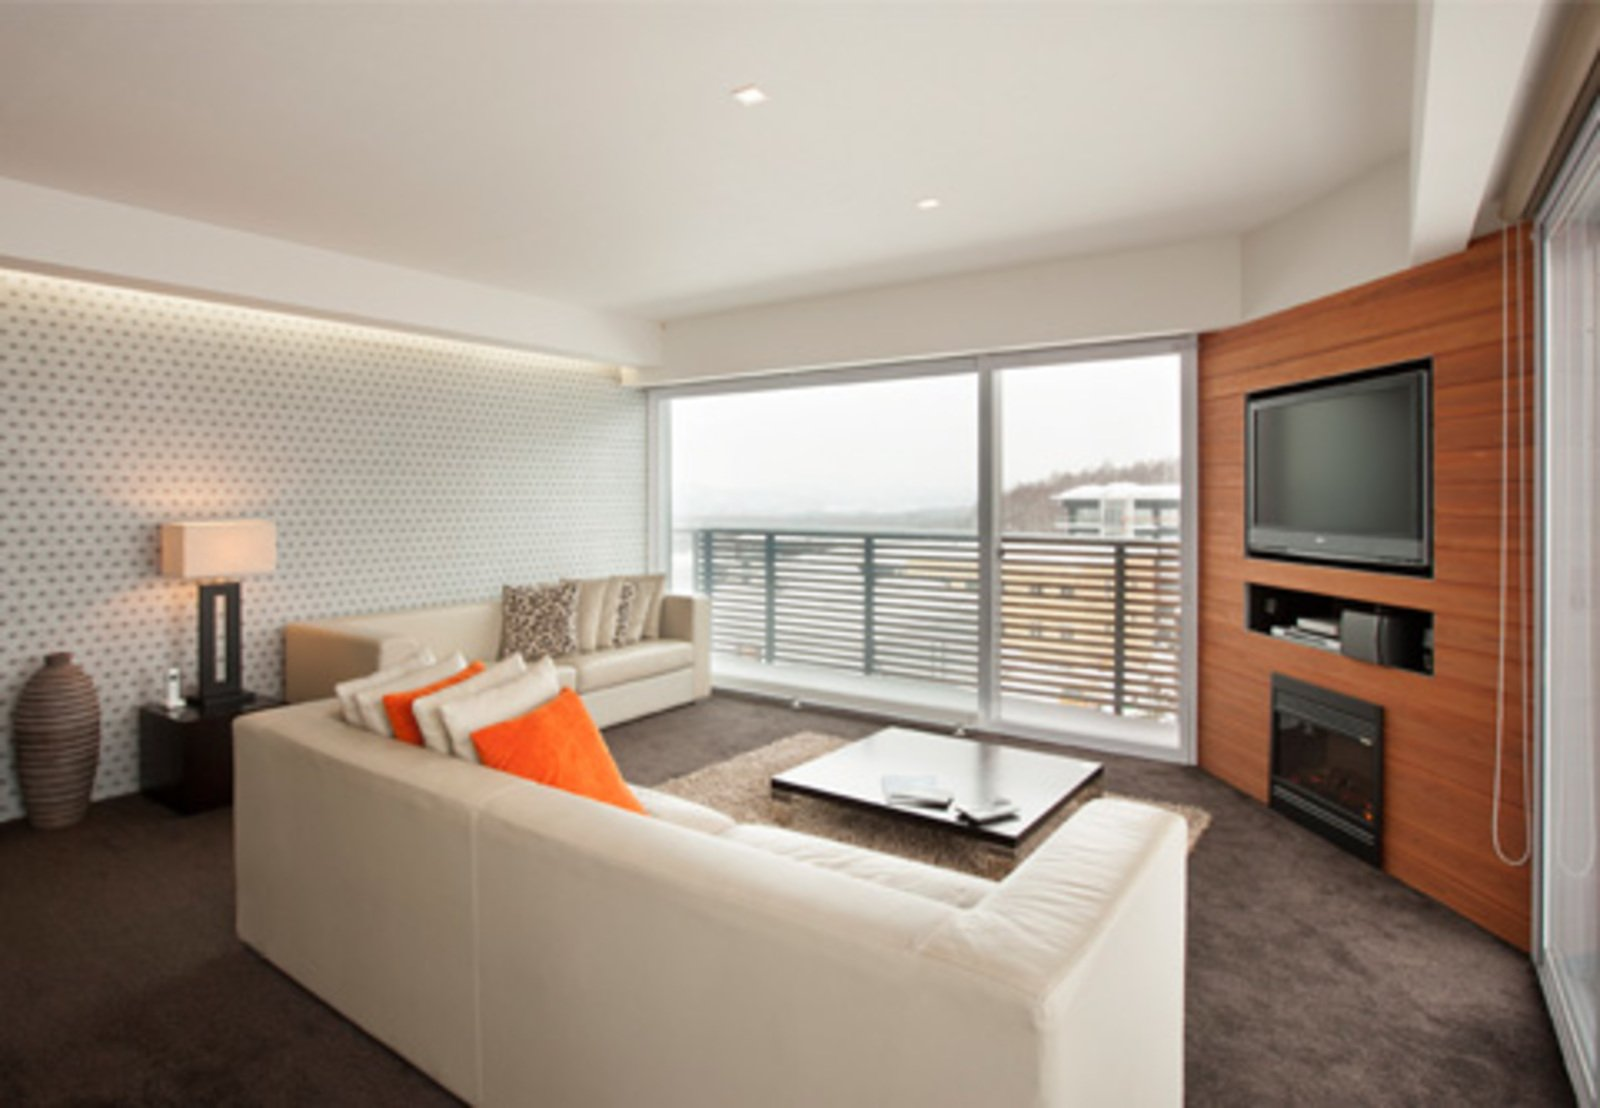 Setsumon 3 bedroom premier apartment living room large